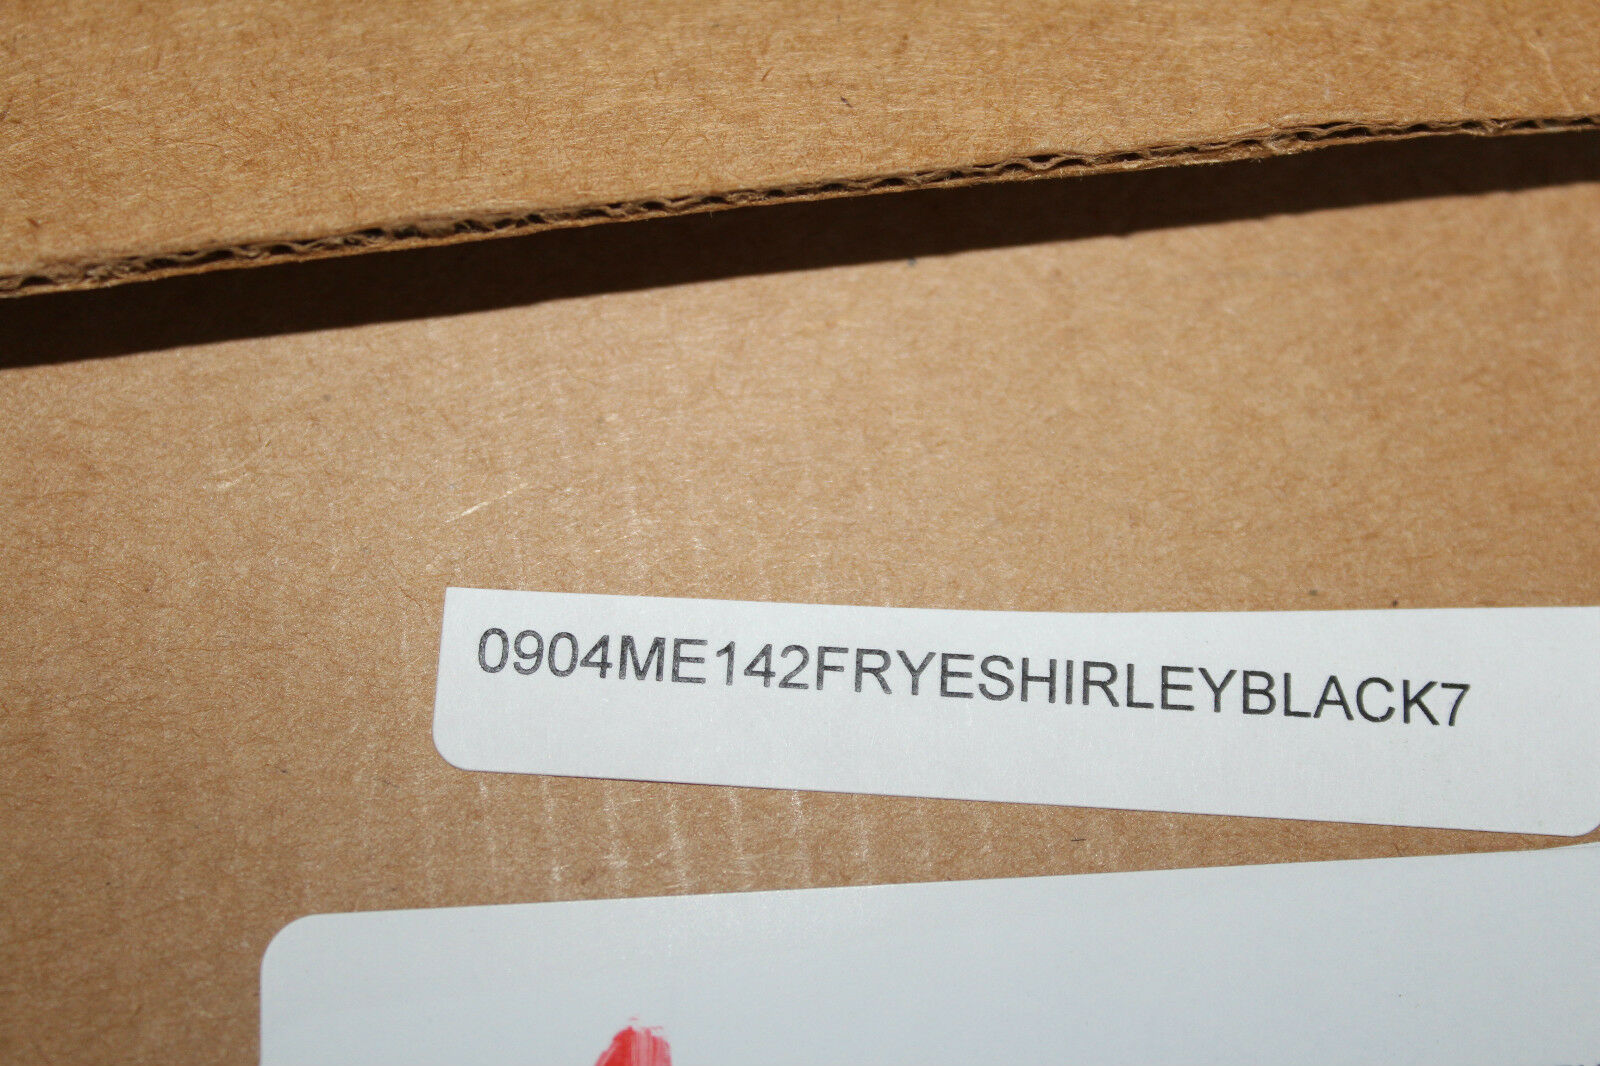 FRYE FRYE FRYE SHIRLEY RIDING BLACK LEATHER  7us  388 149805